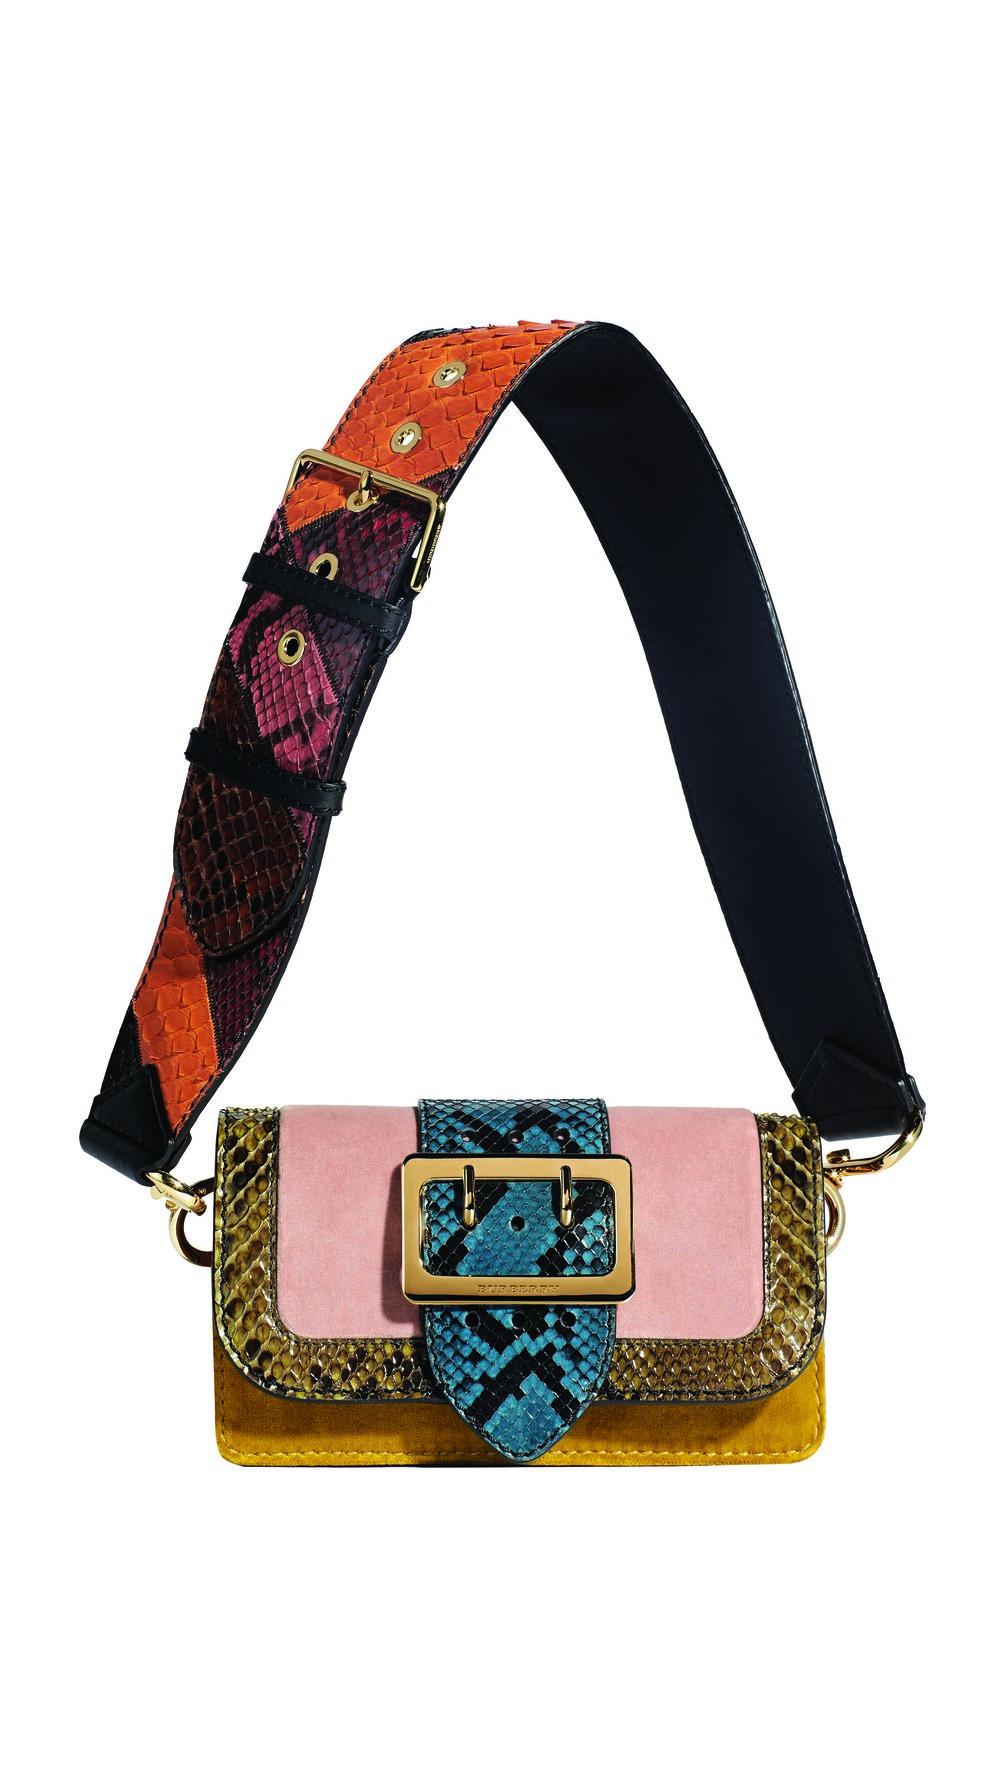 Burberry Patchwork Textured Suede Leopard-Print Calfskin bag $2,895